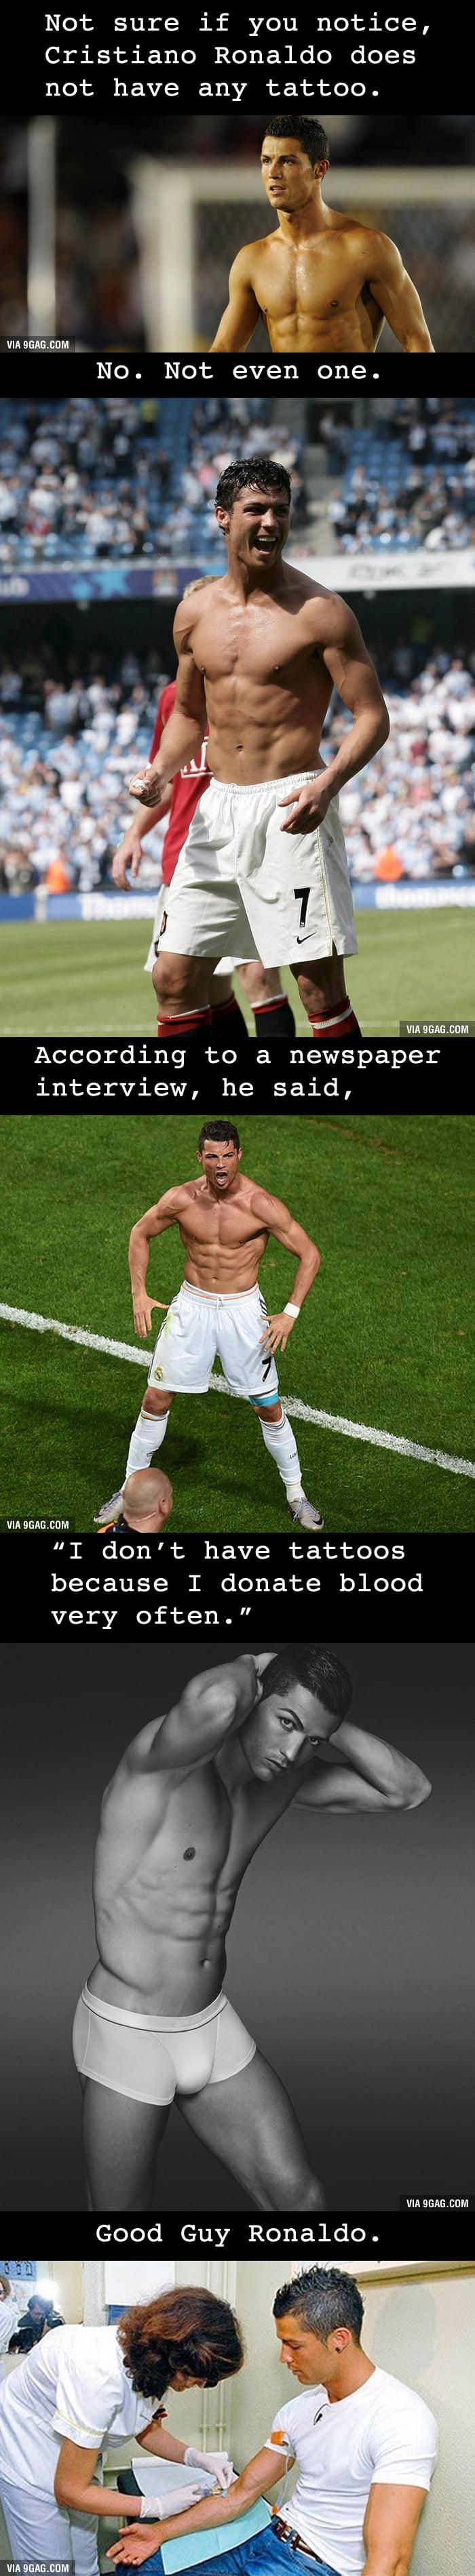 Mystery unveiled: of Cristiano Ronaldo tattoo